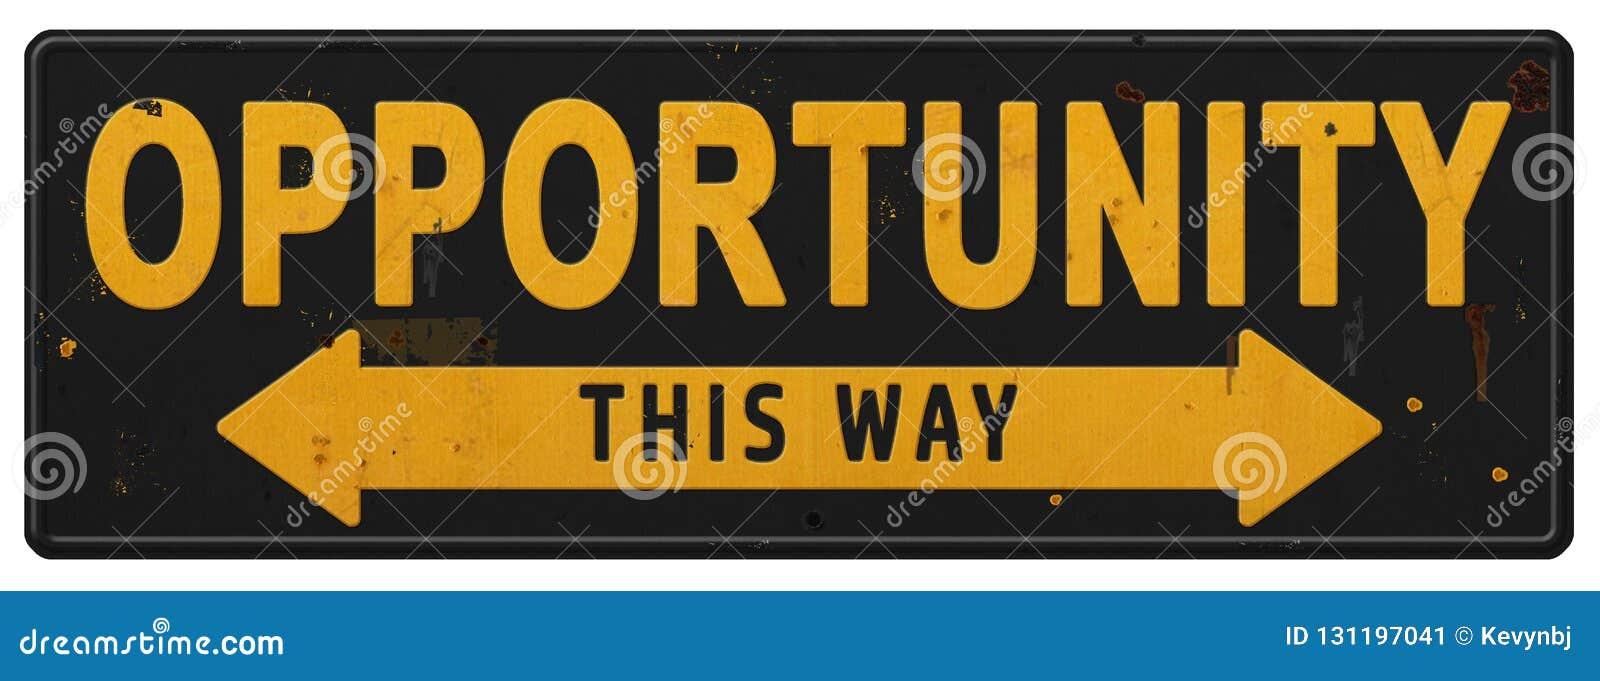 Kansteken Logo Art Business Possibilities Goal Accomlishment